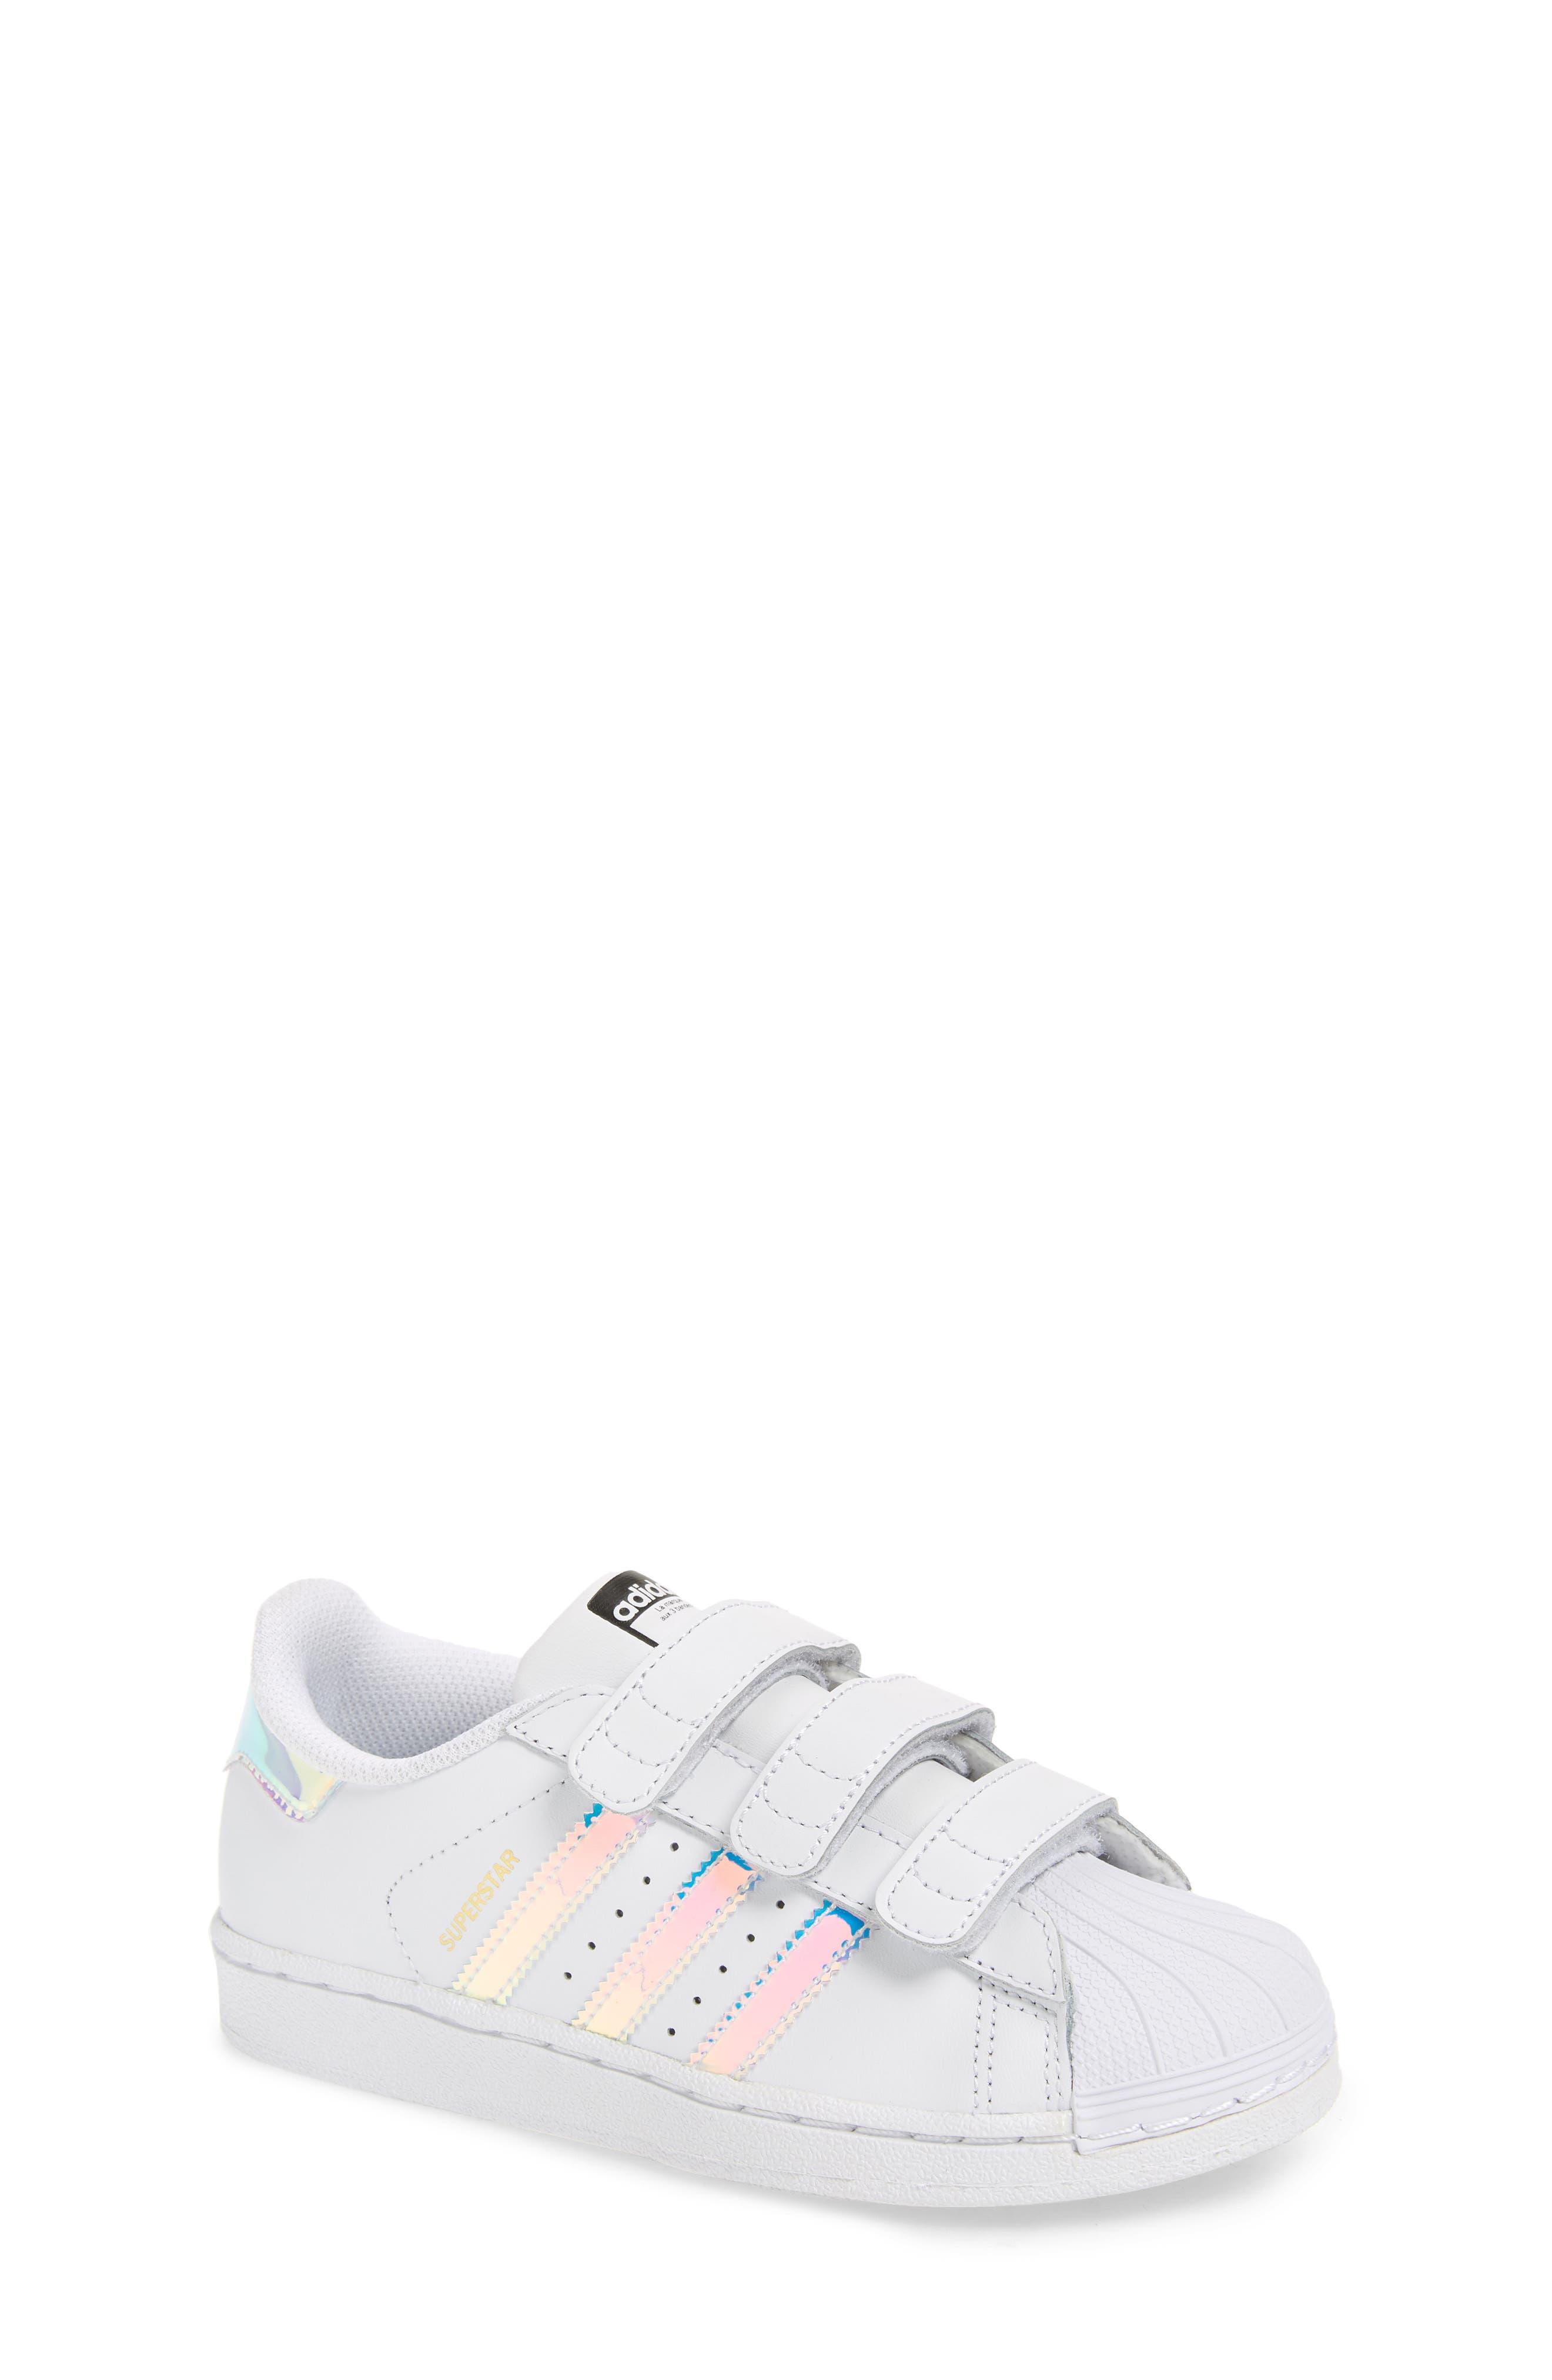 Superstar - Iridescent Sneaker,                             Main thumbnail 1, color,                             100